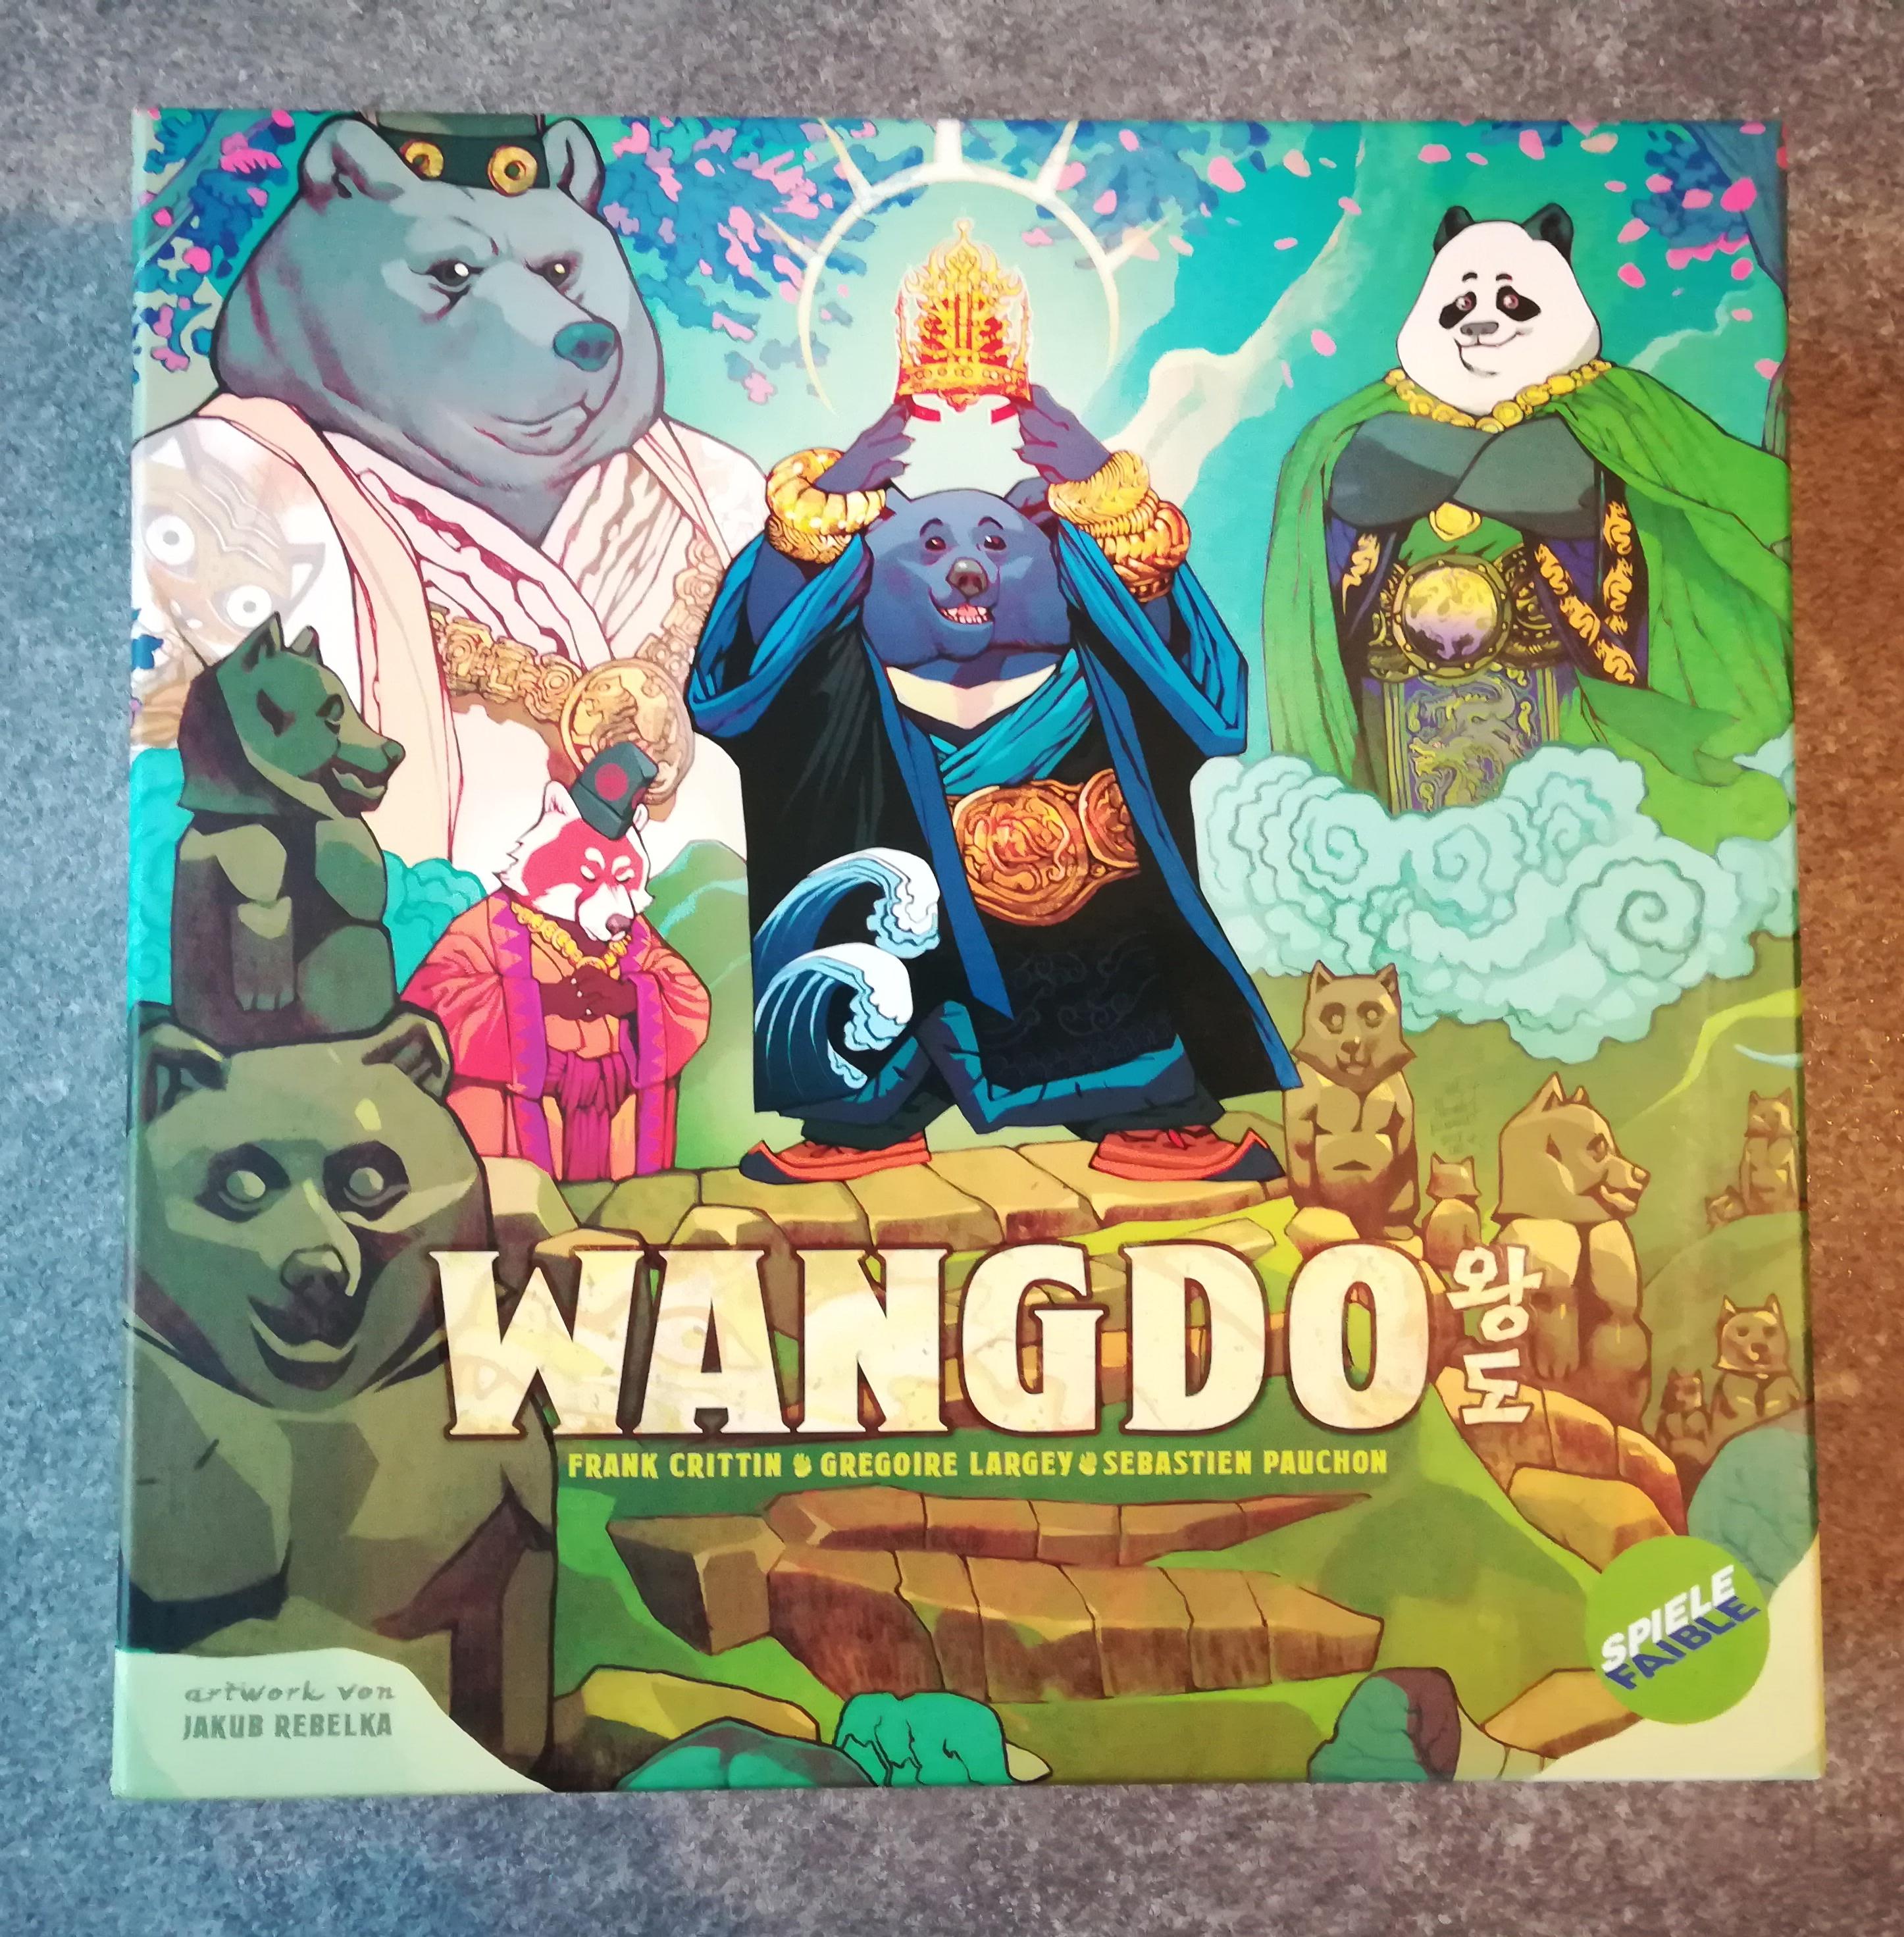 Wangdo Cover